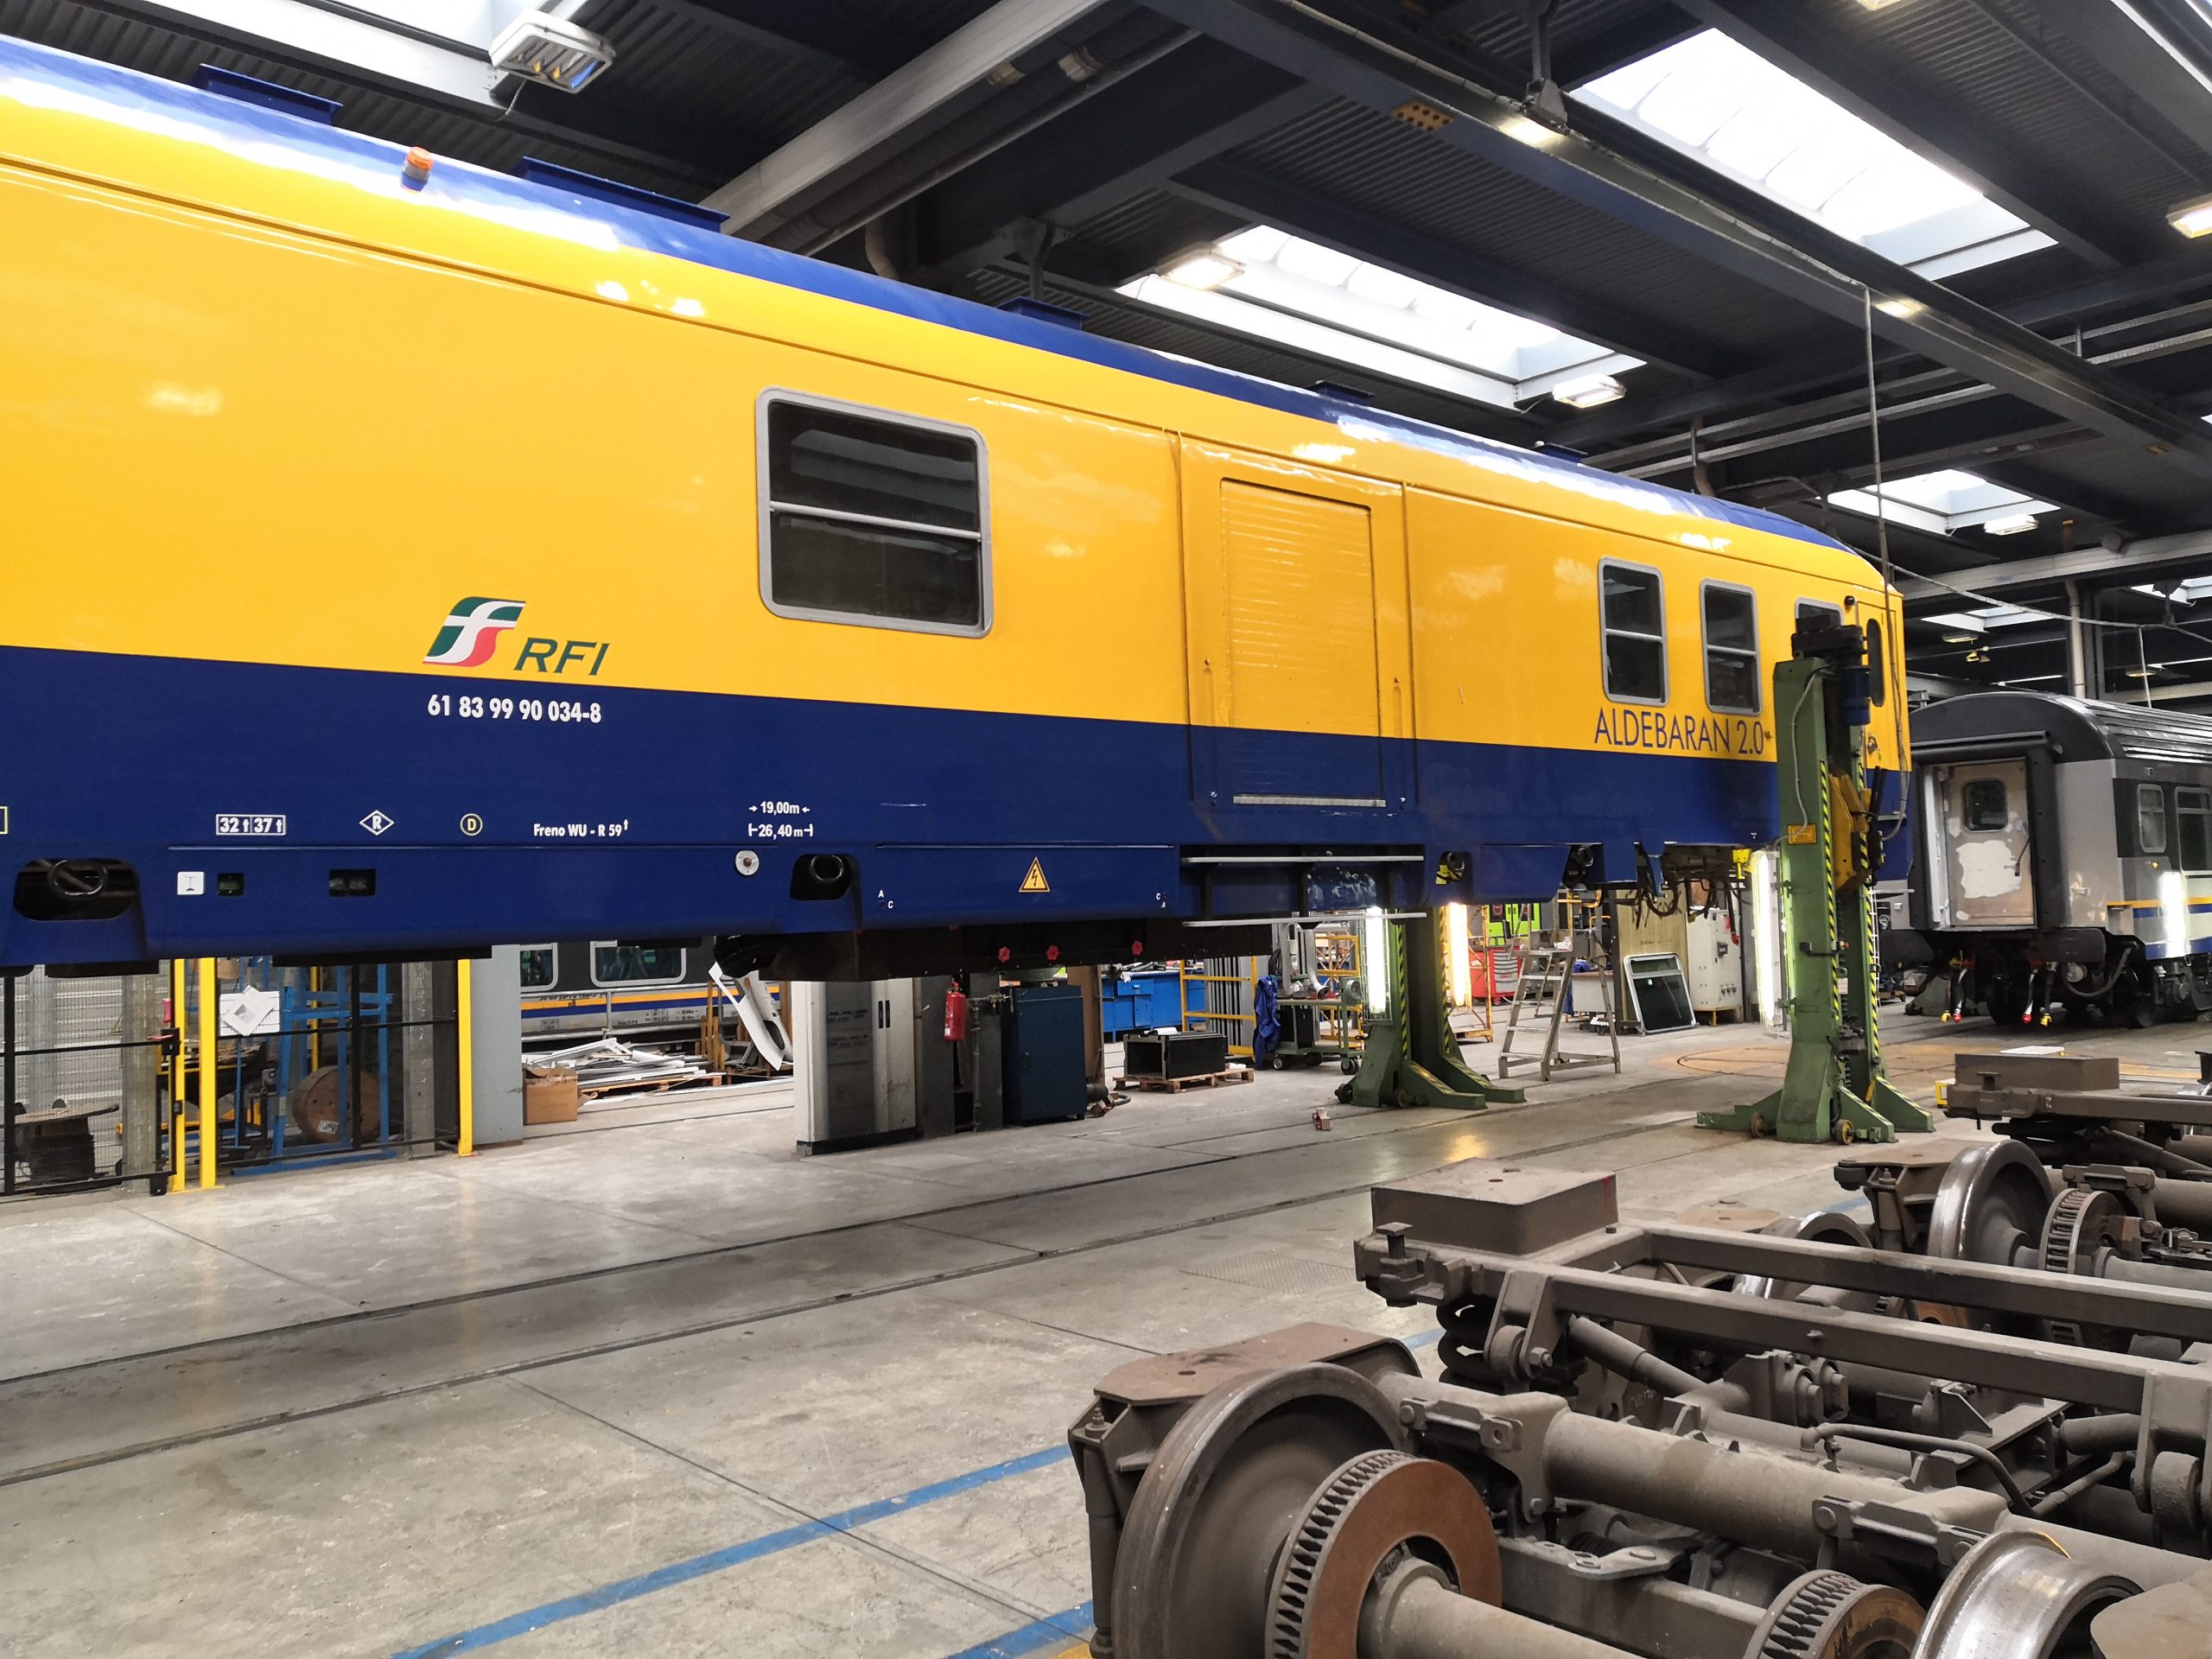 The Aldebaran 2.0 diagnostics wagon, photo: RFI